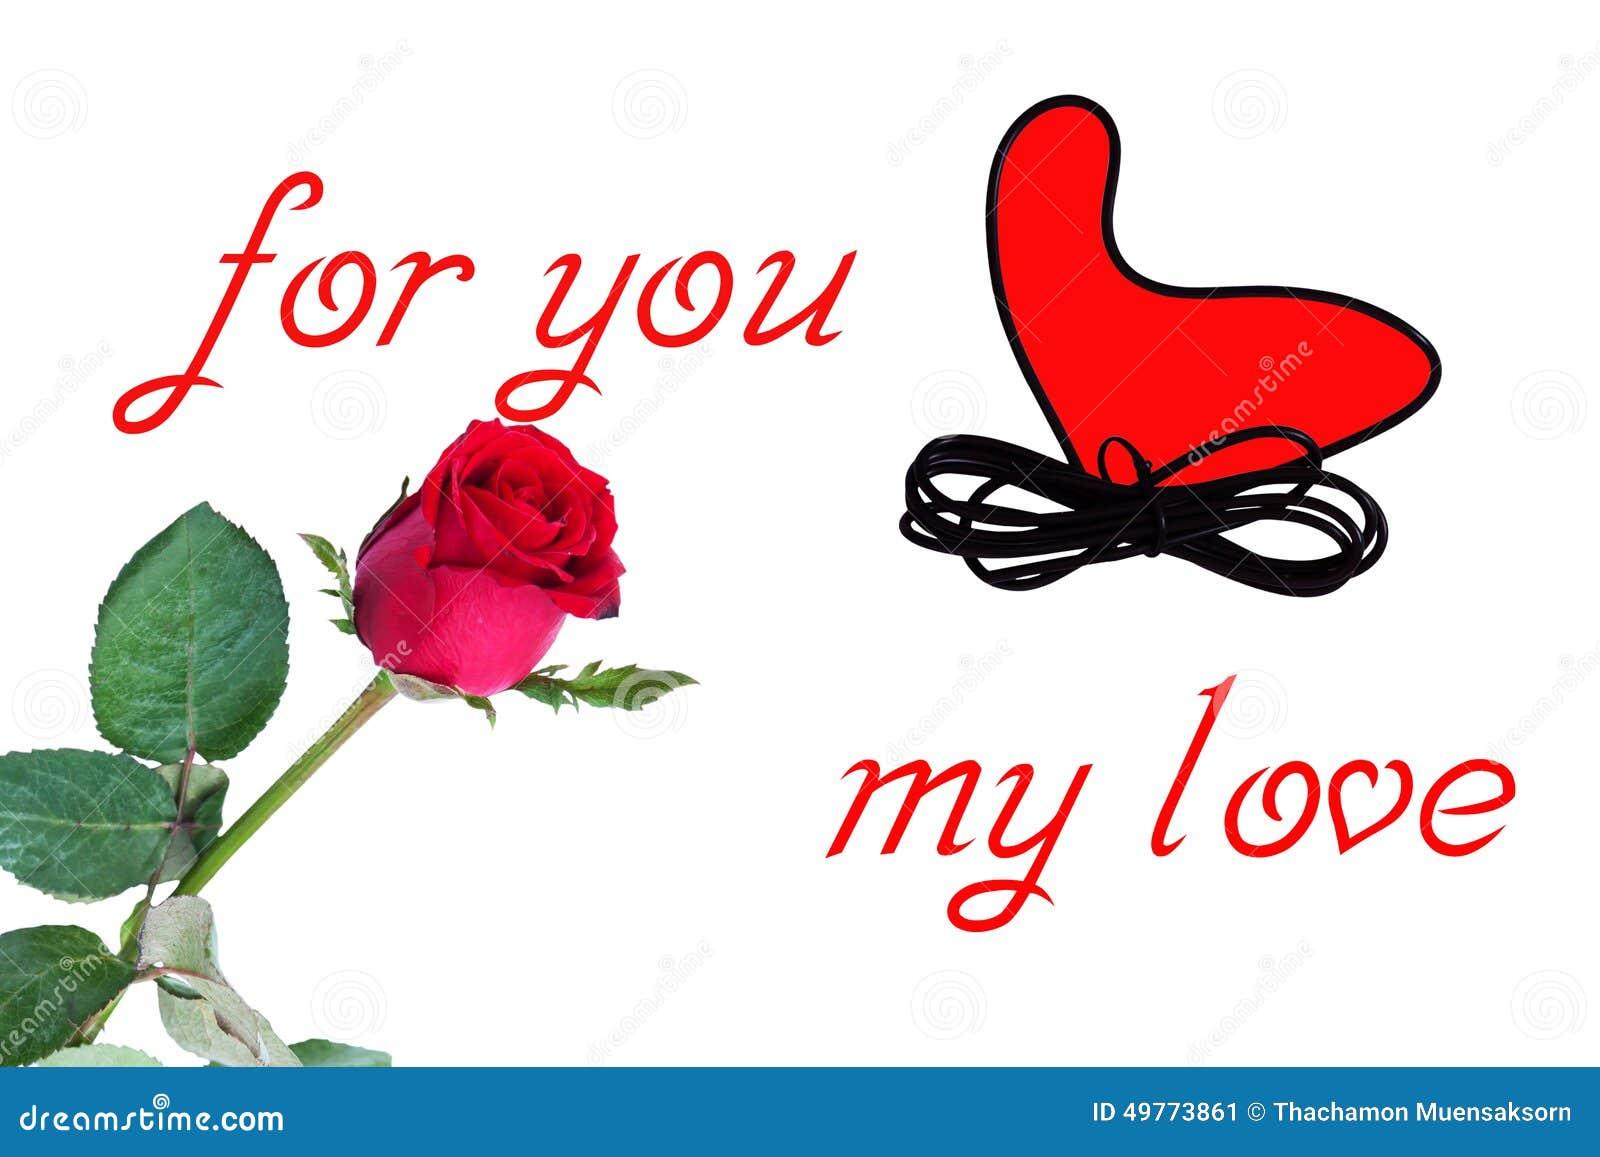 Red Rose Flower Stock Image Image Of Beautiful Shot 49773861